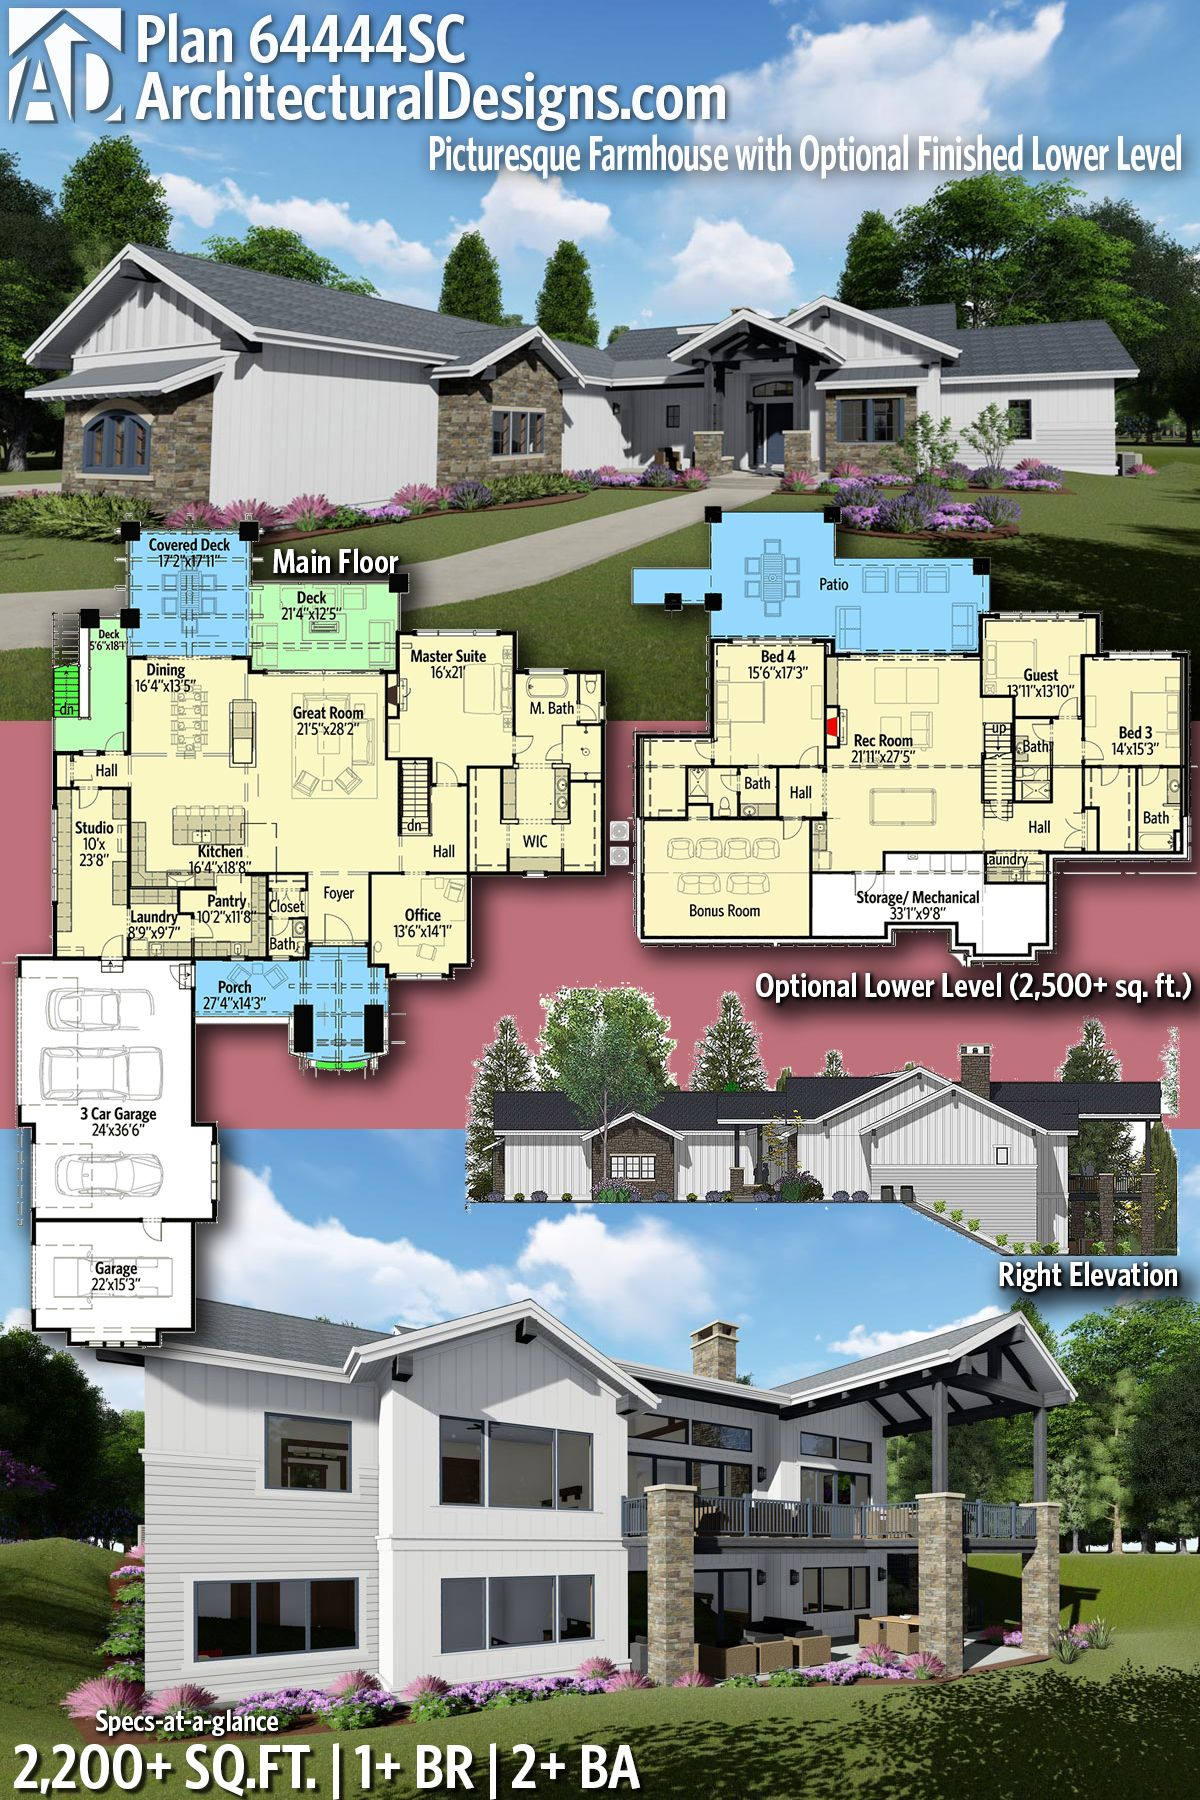 Architectural Designs Farmhouse House Plan 64444SC gives